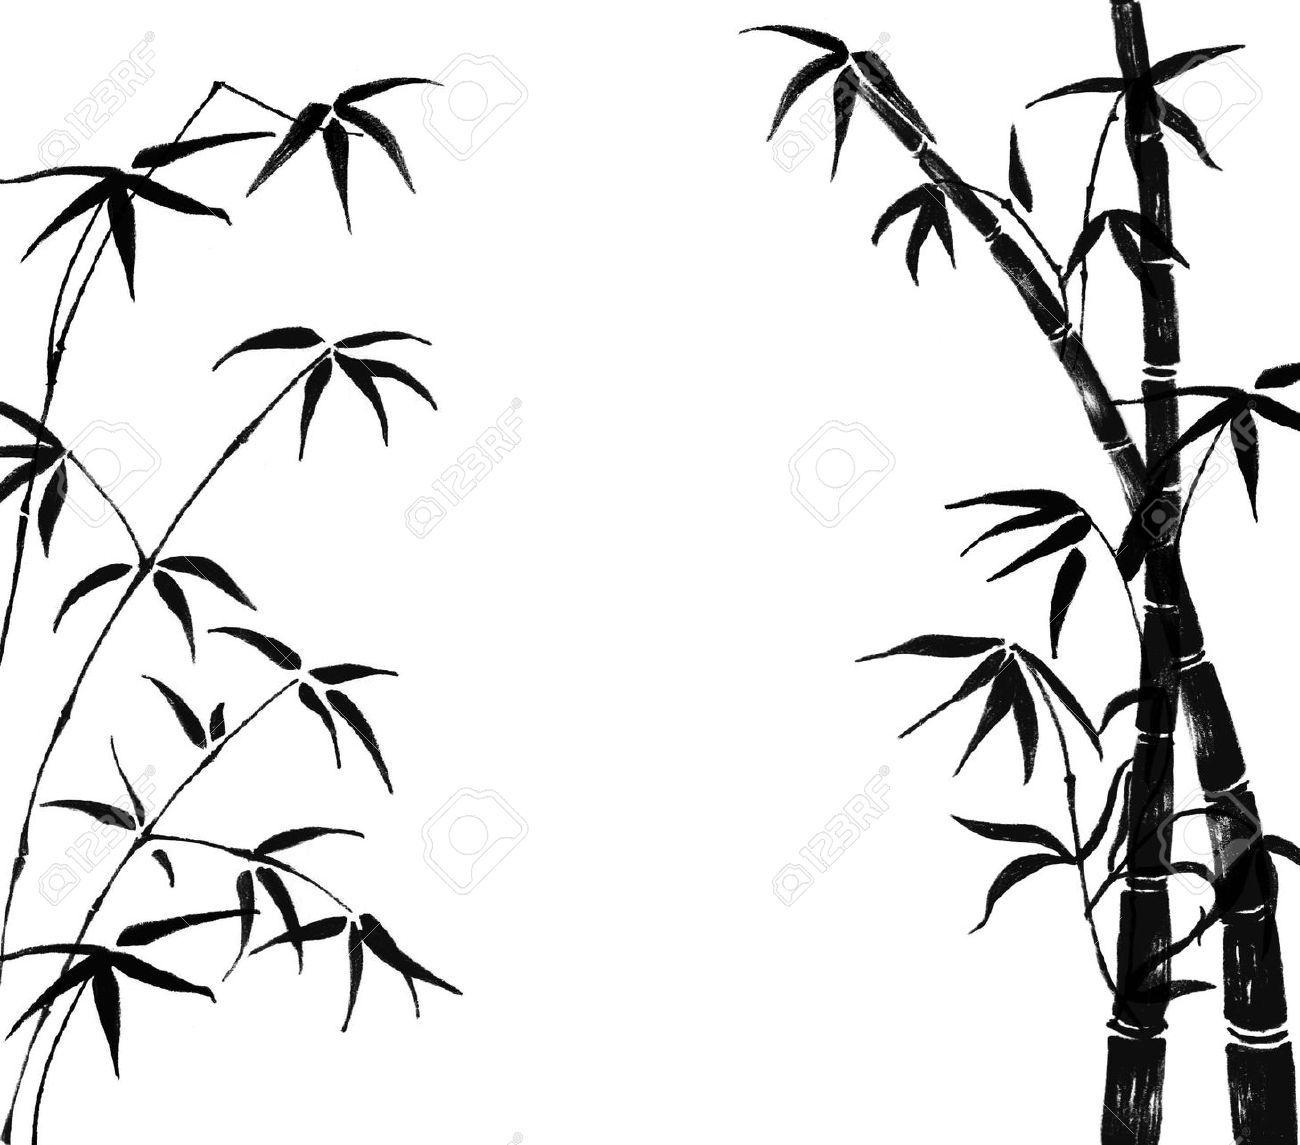 Clipart kaikai kan banner freeuse library Pin by Kyle Milligan on Kaikai Coconut | Bamboo image, Bamboo ... banner freeuse library